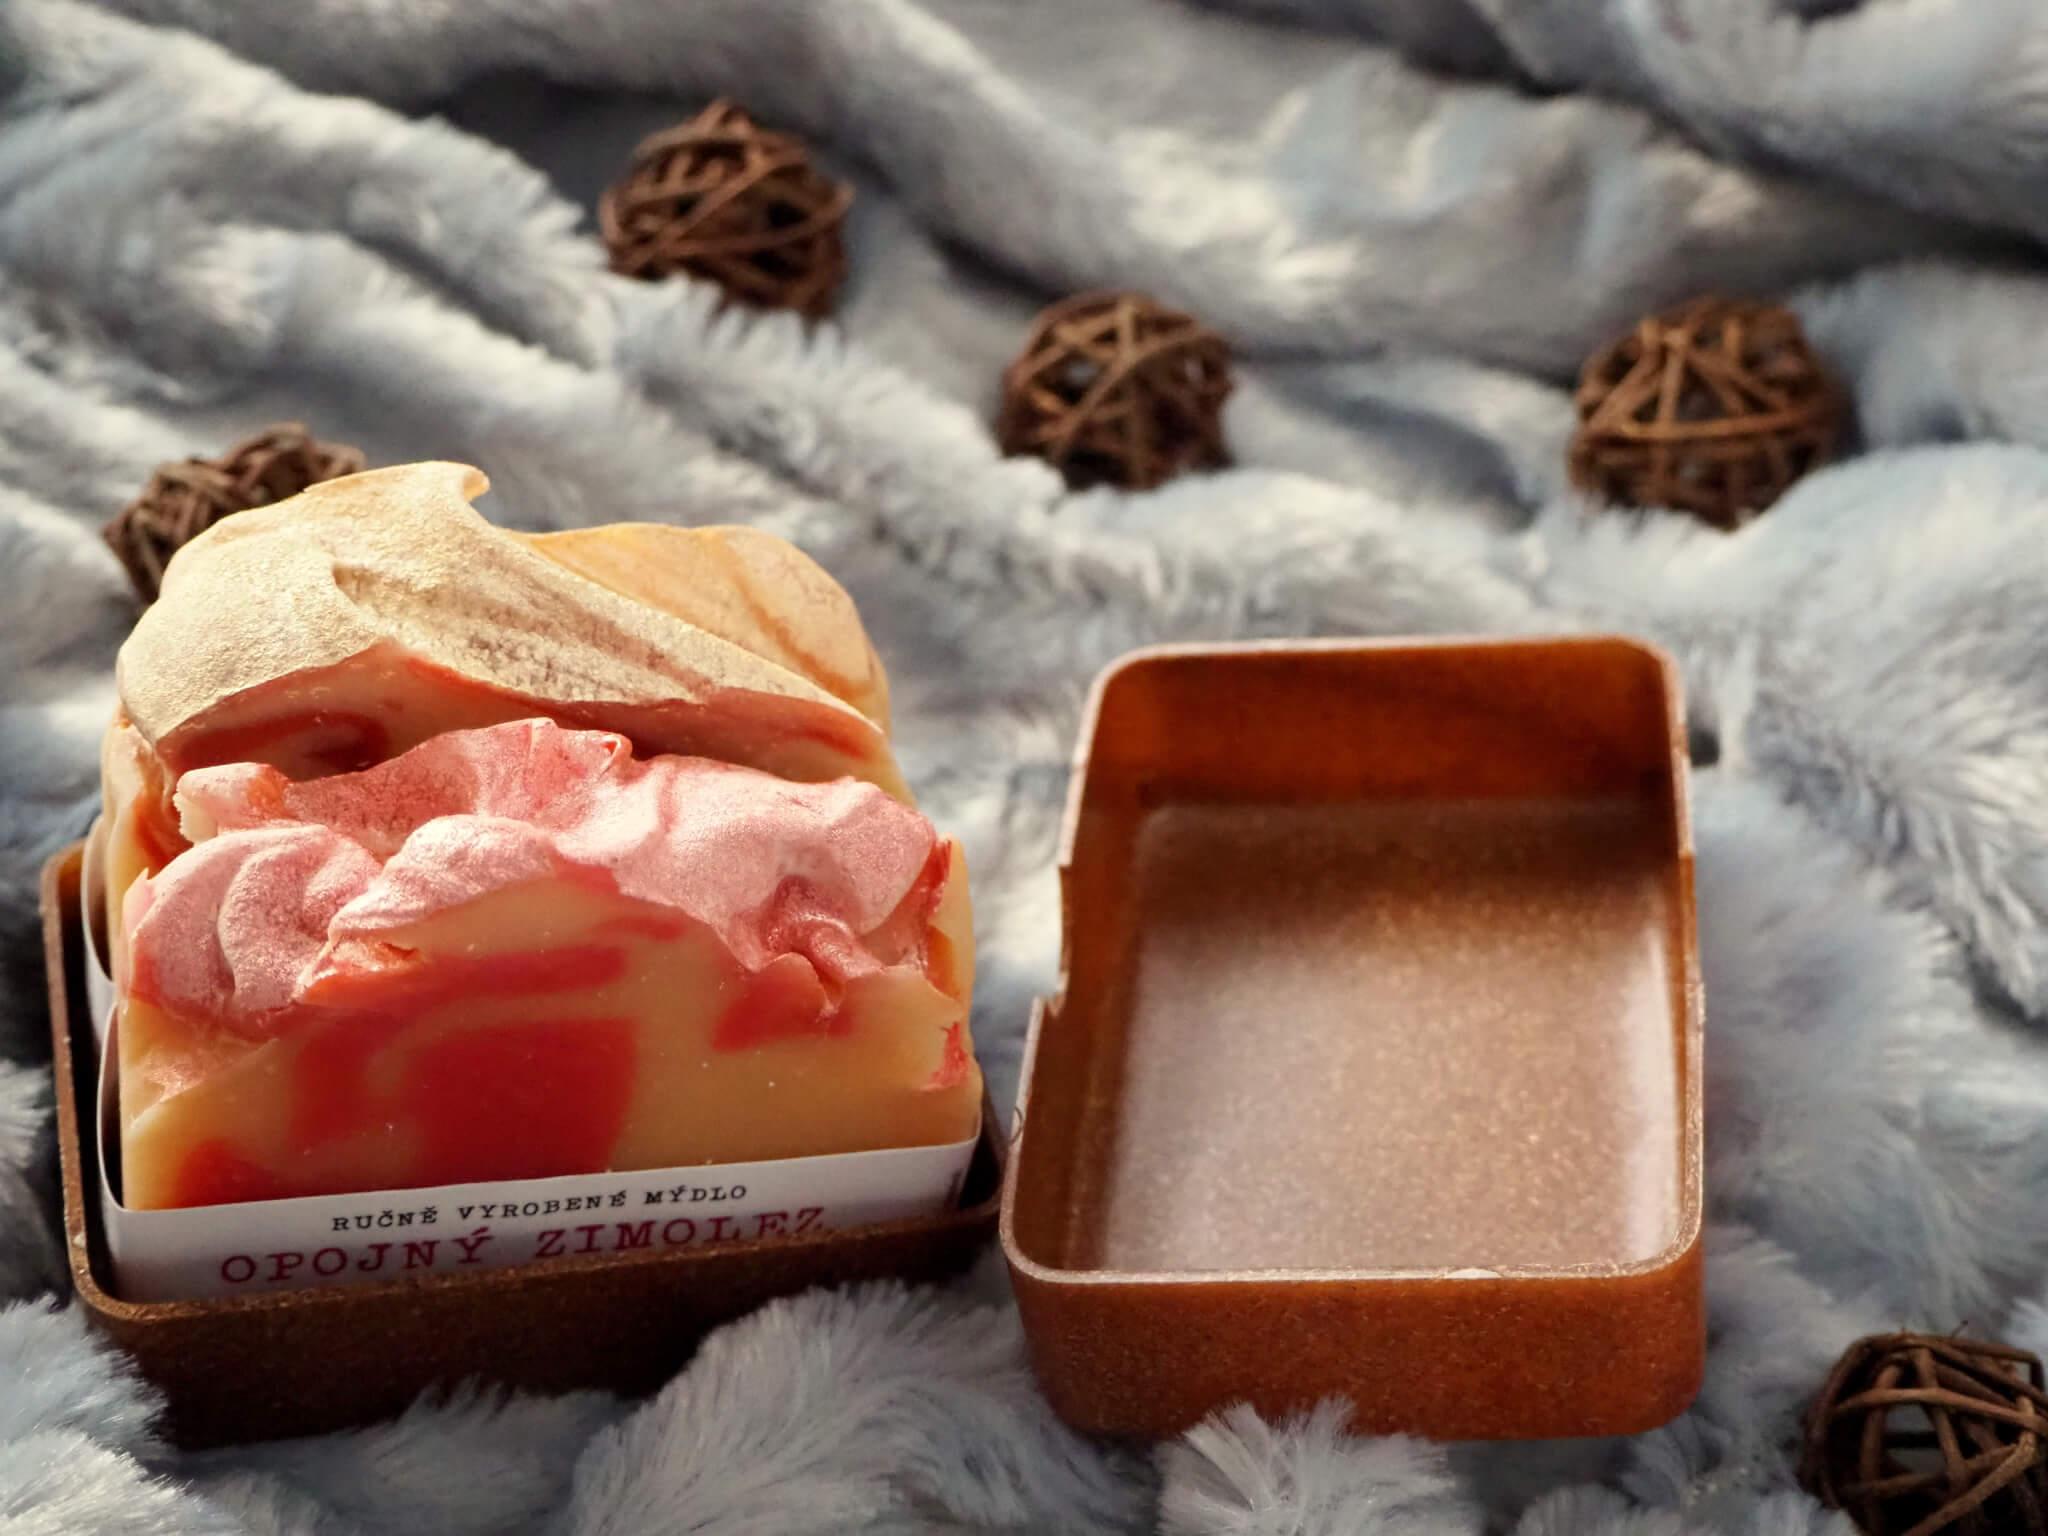 mydlo - opojný zimolez